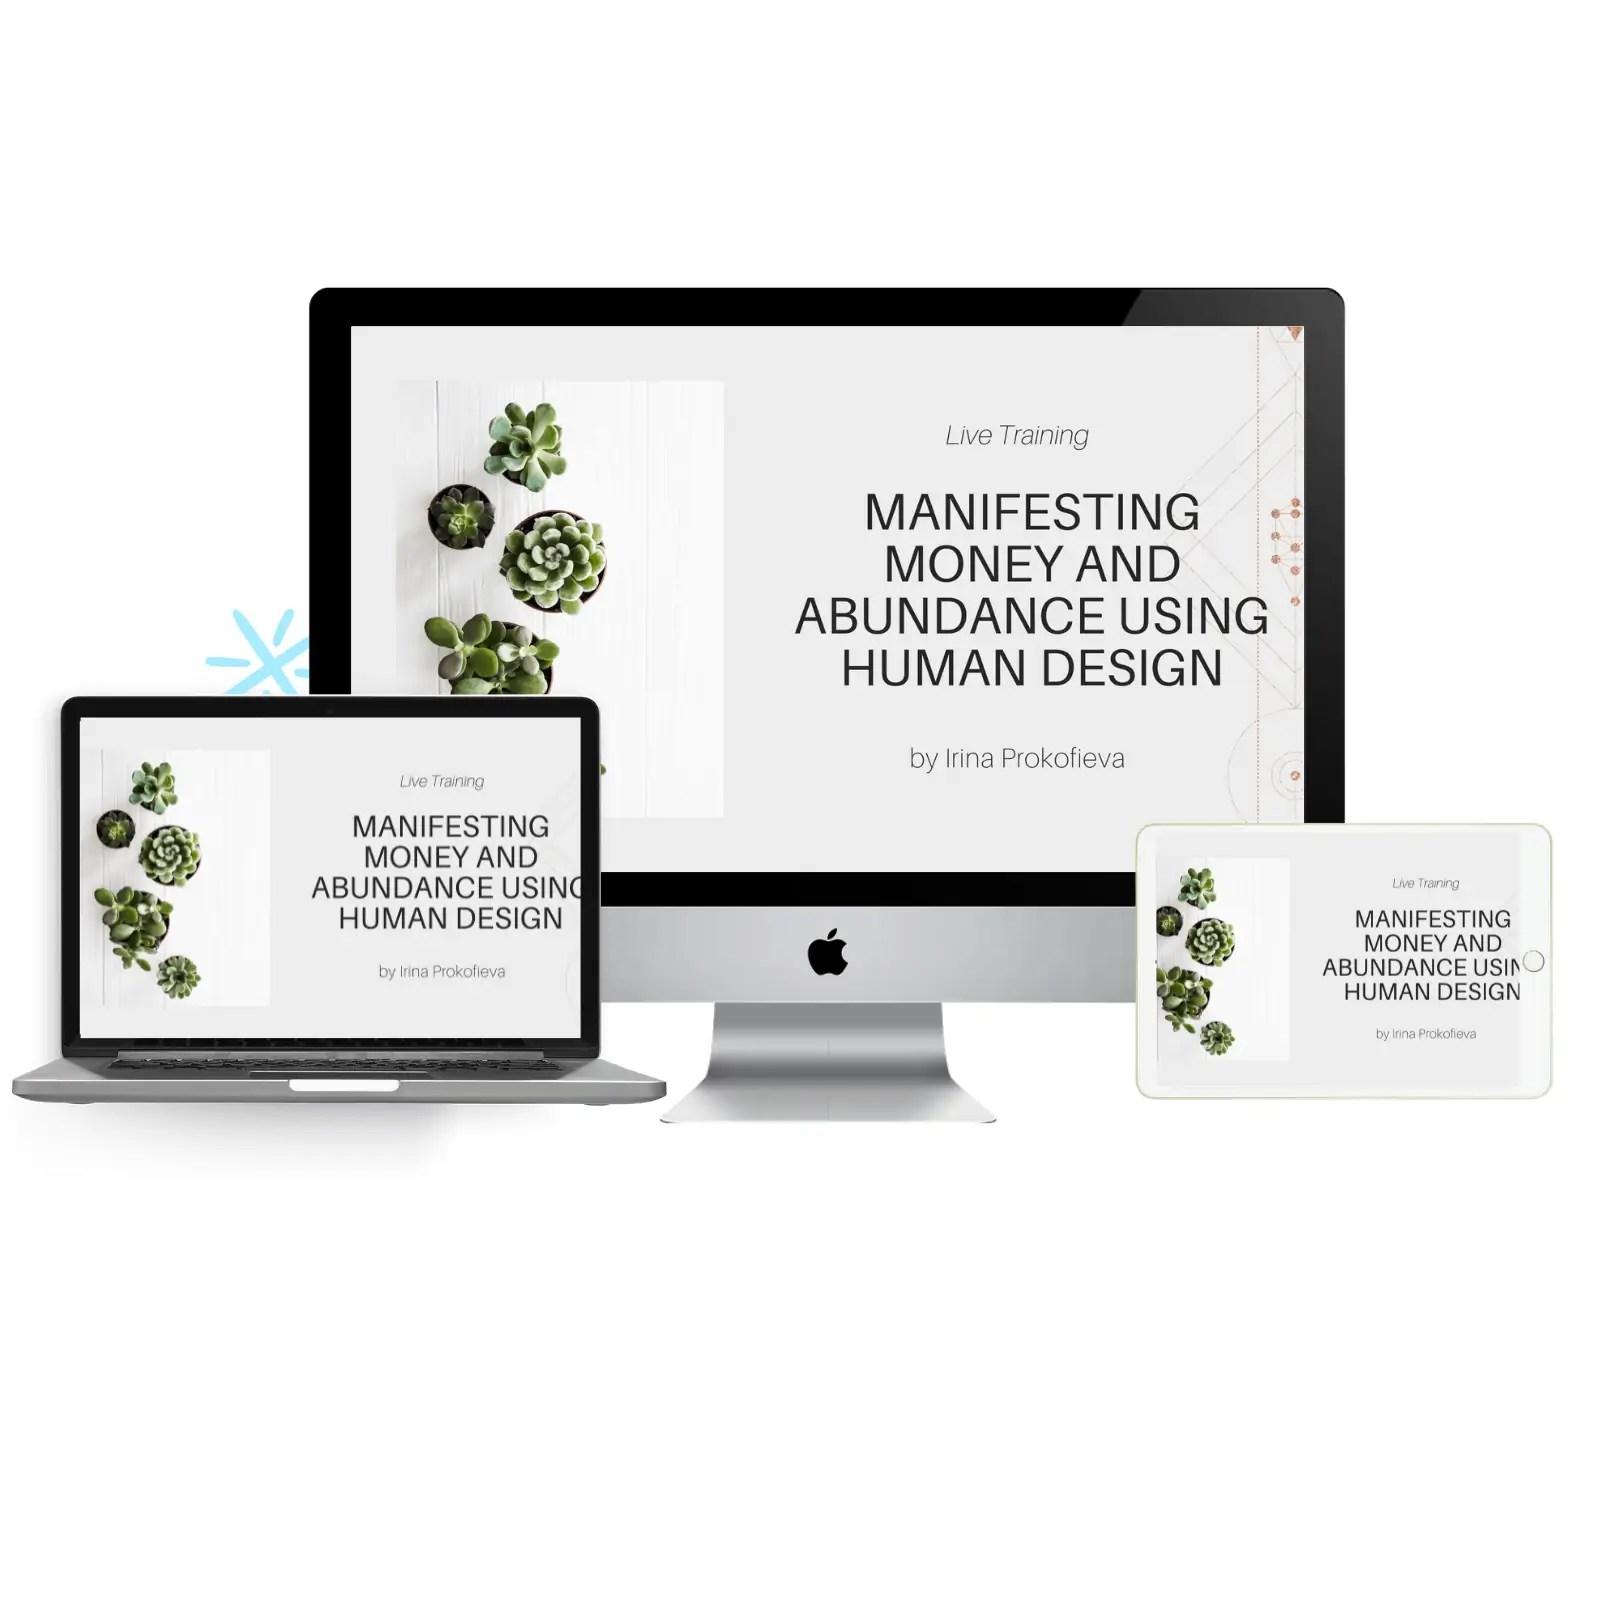 Manifesting money and abundance using human design